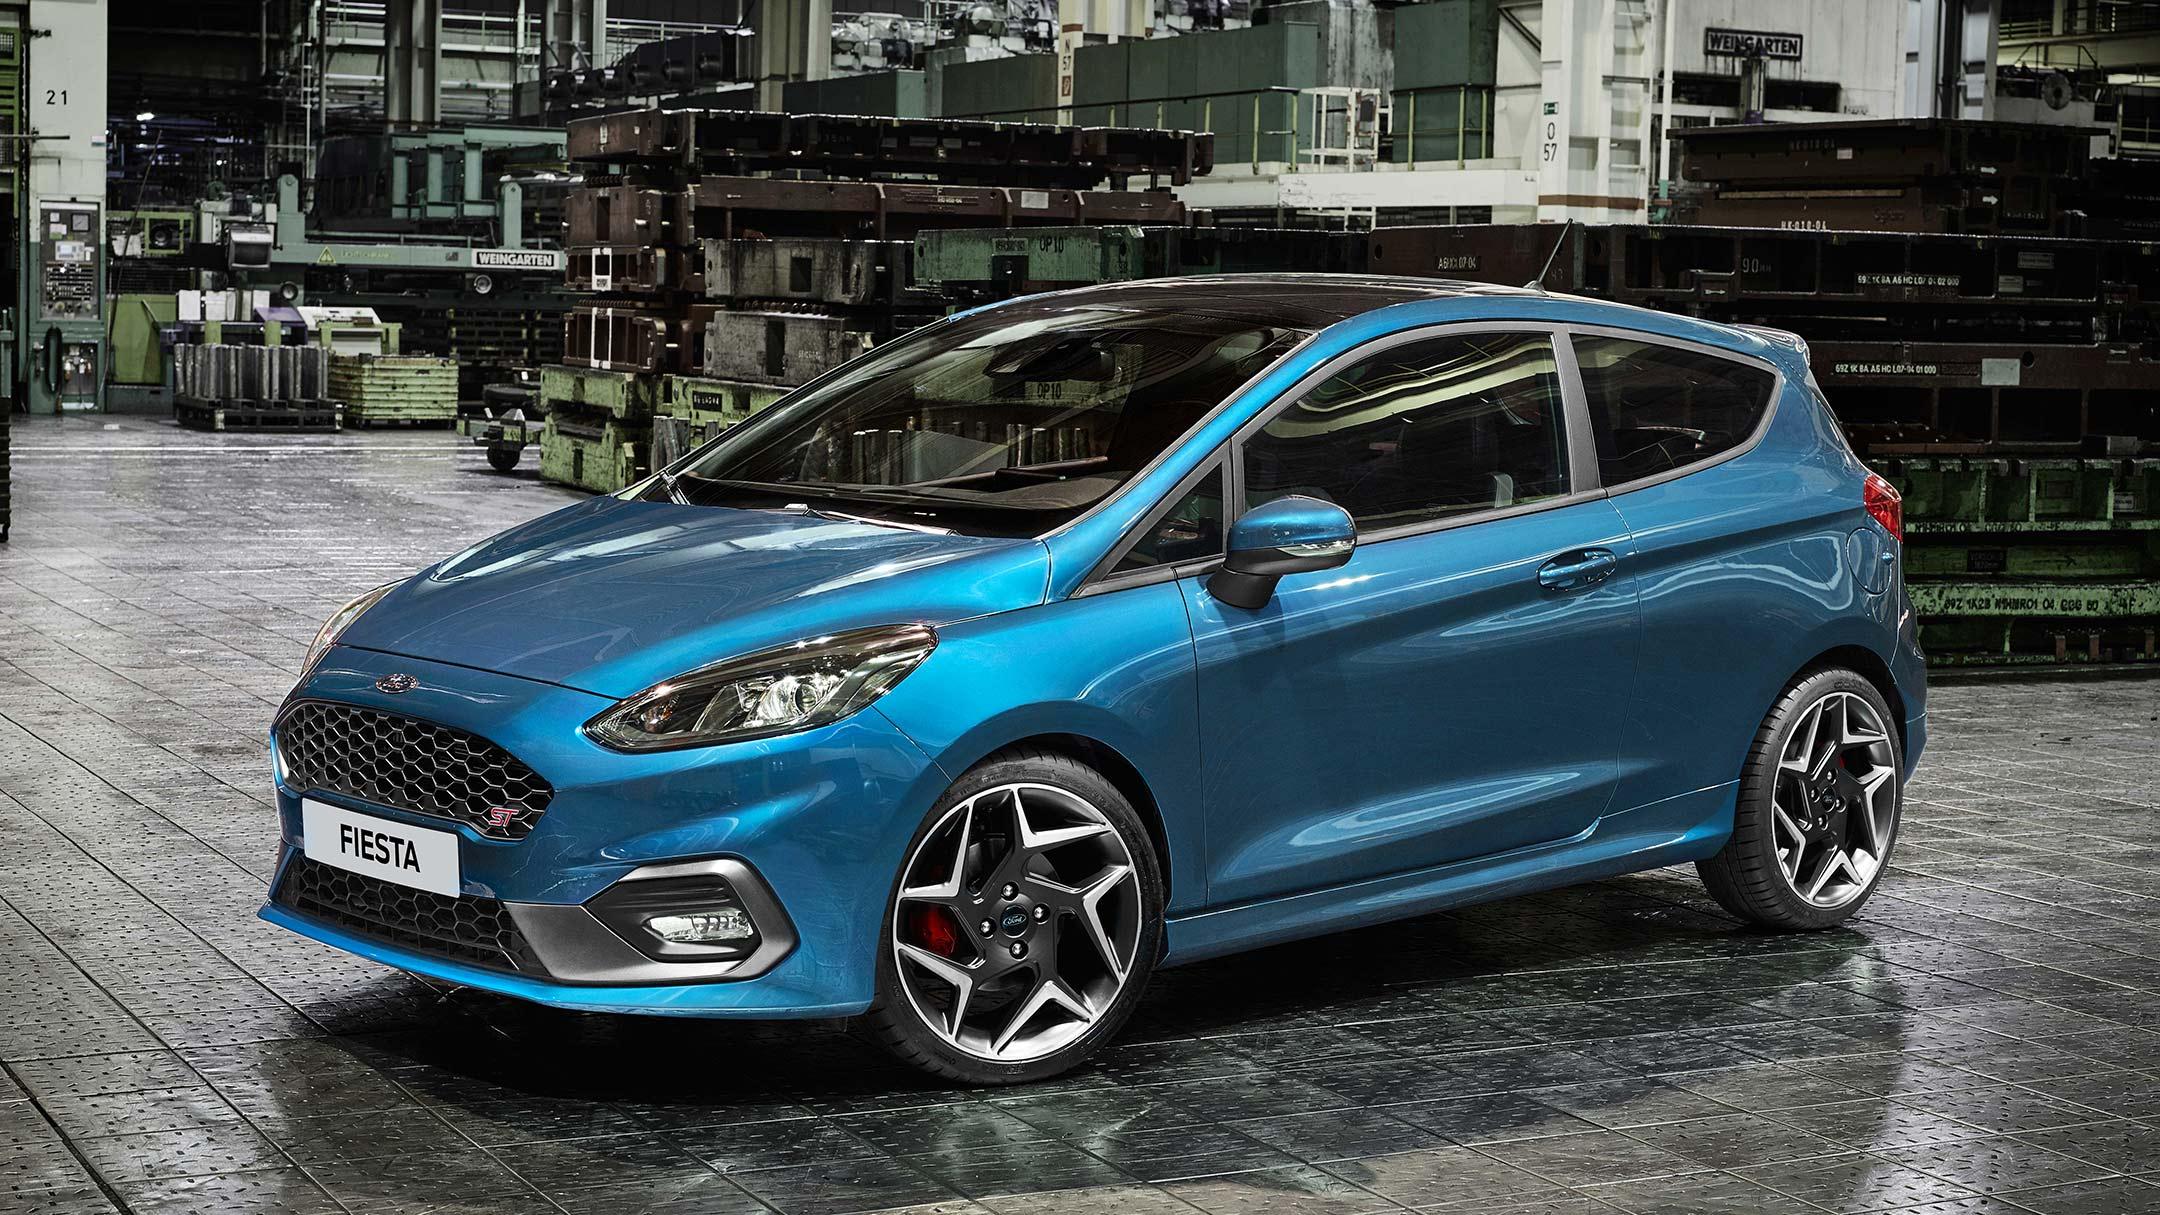 Ford investim 11 miliard dollar p r 40 makina elektrike for Ford motor company vision